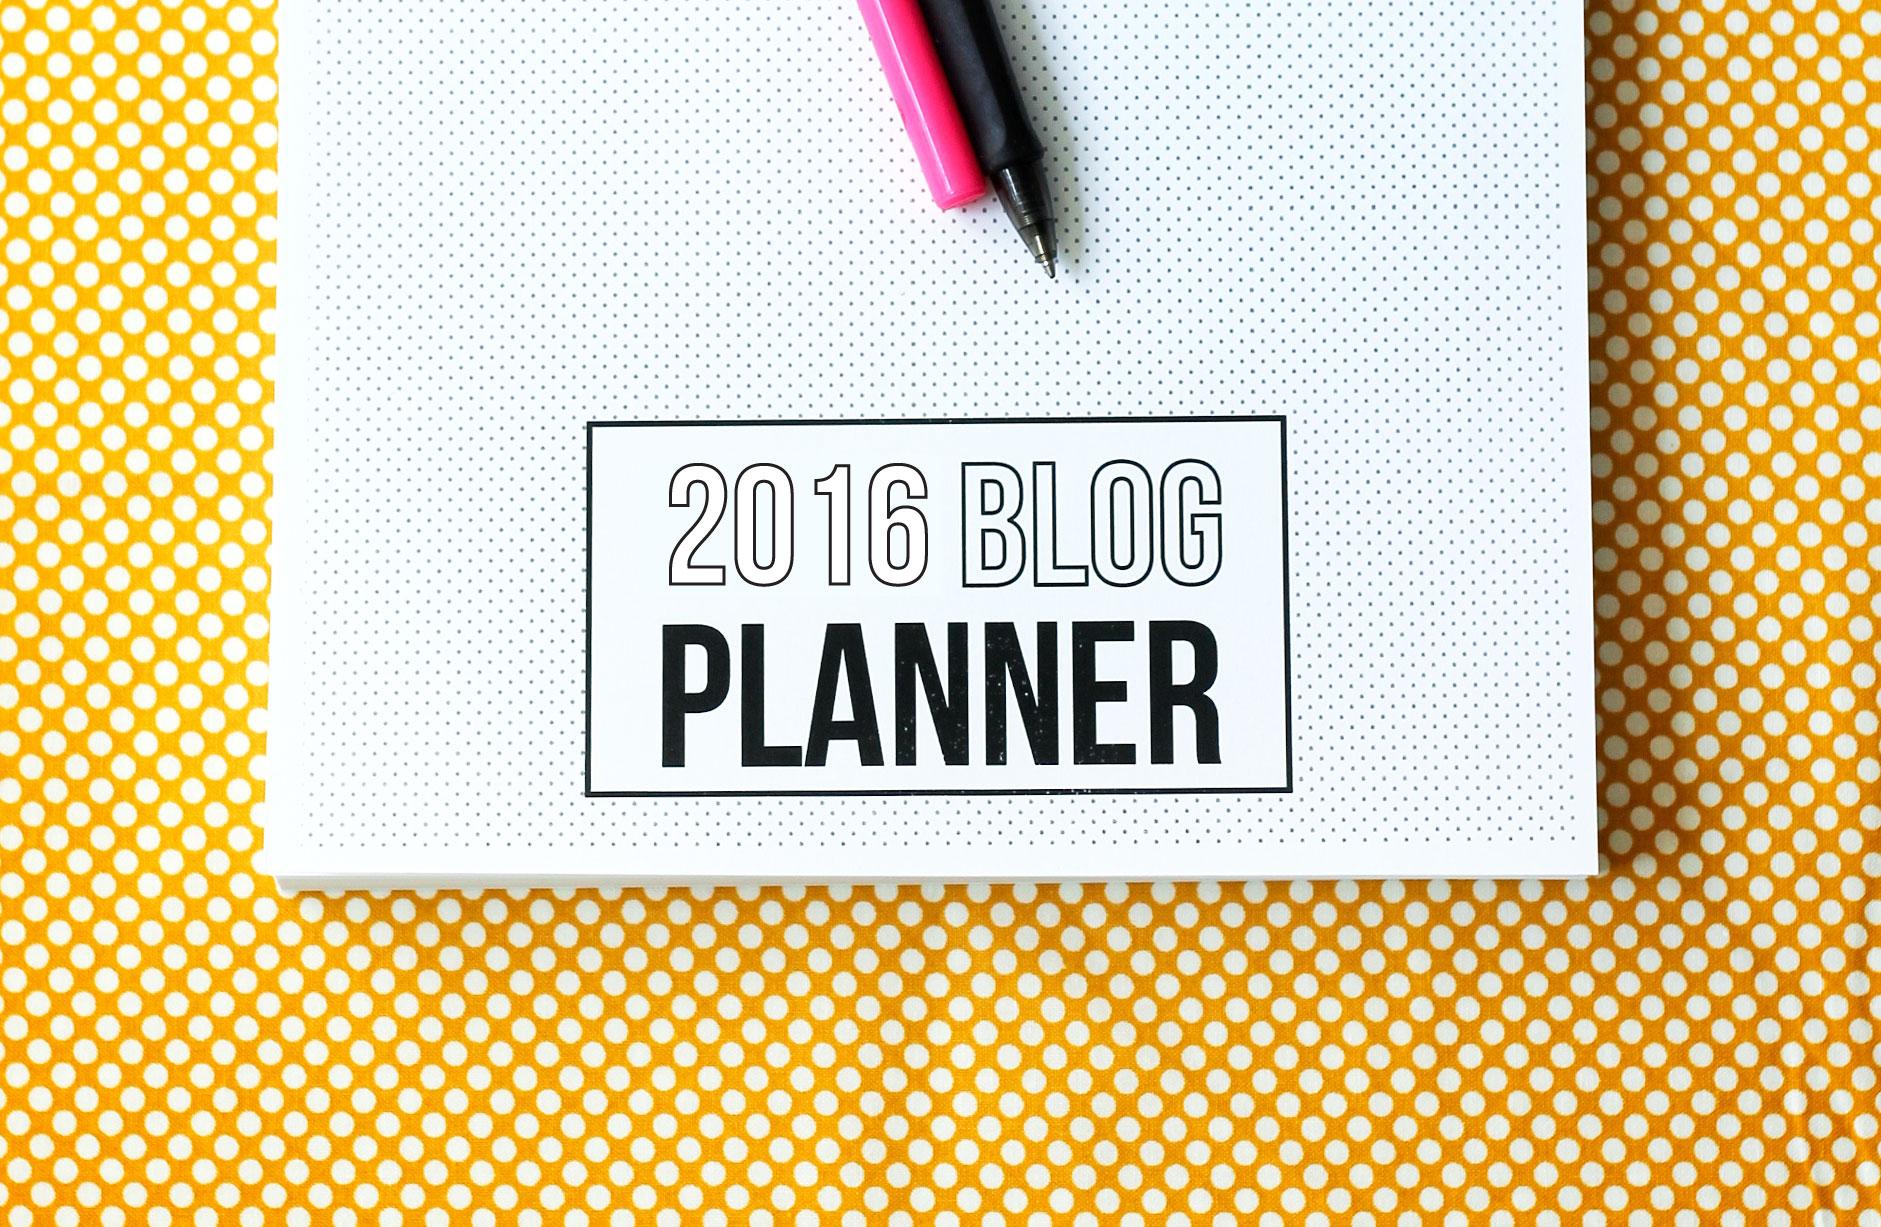 2016-Blog-Planner-and-Editorial-Calendar-2.jpg